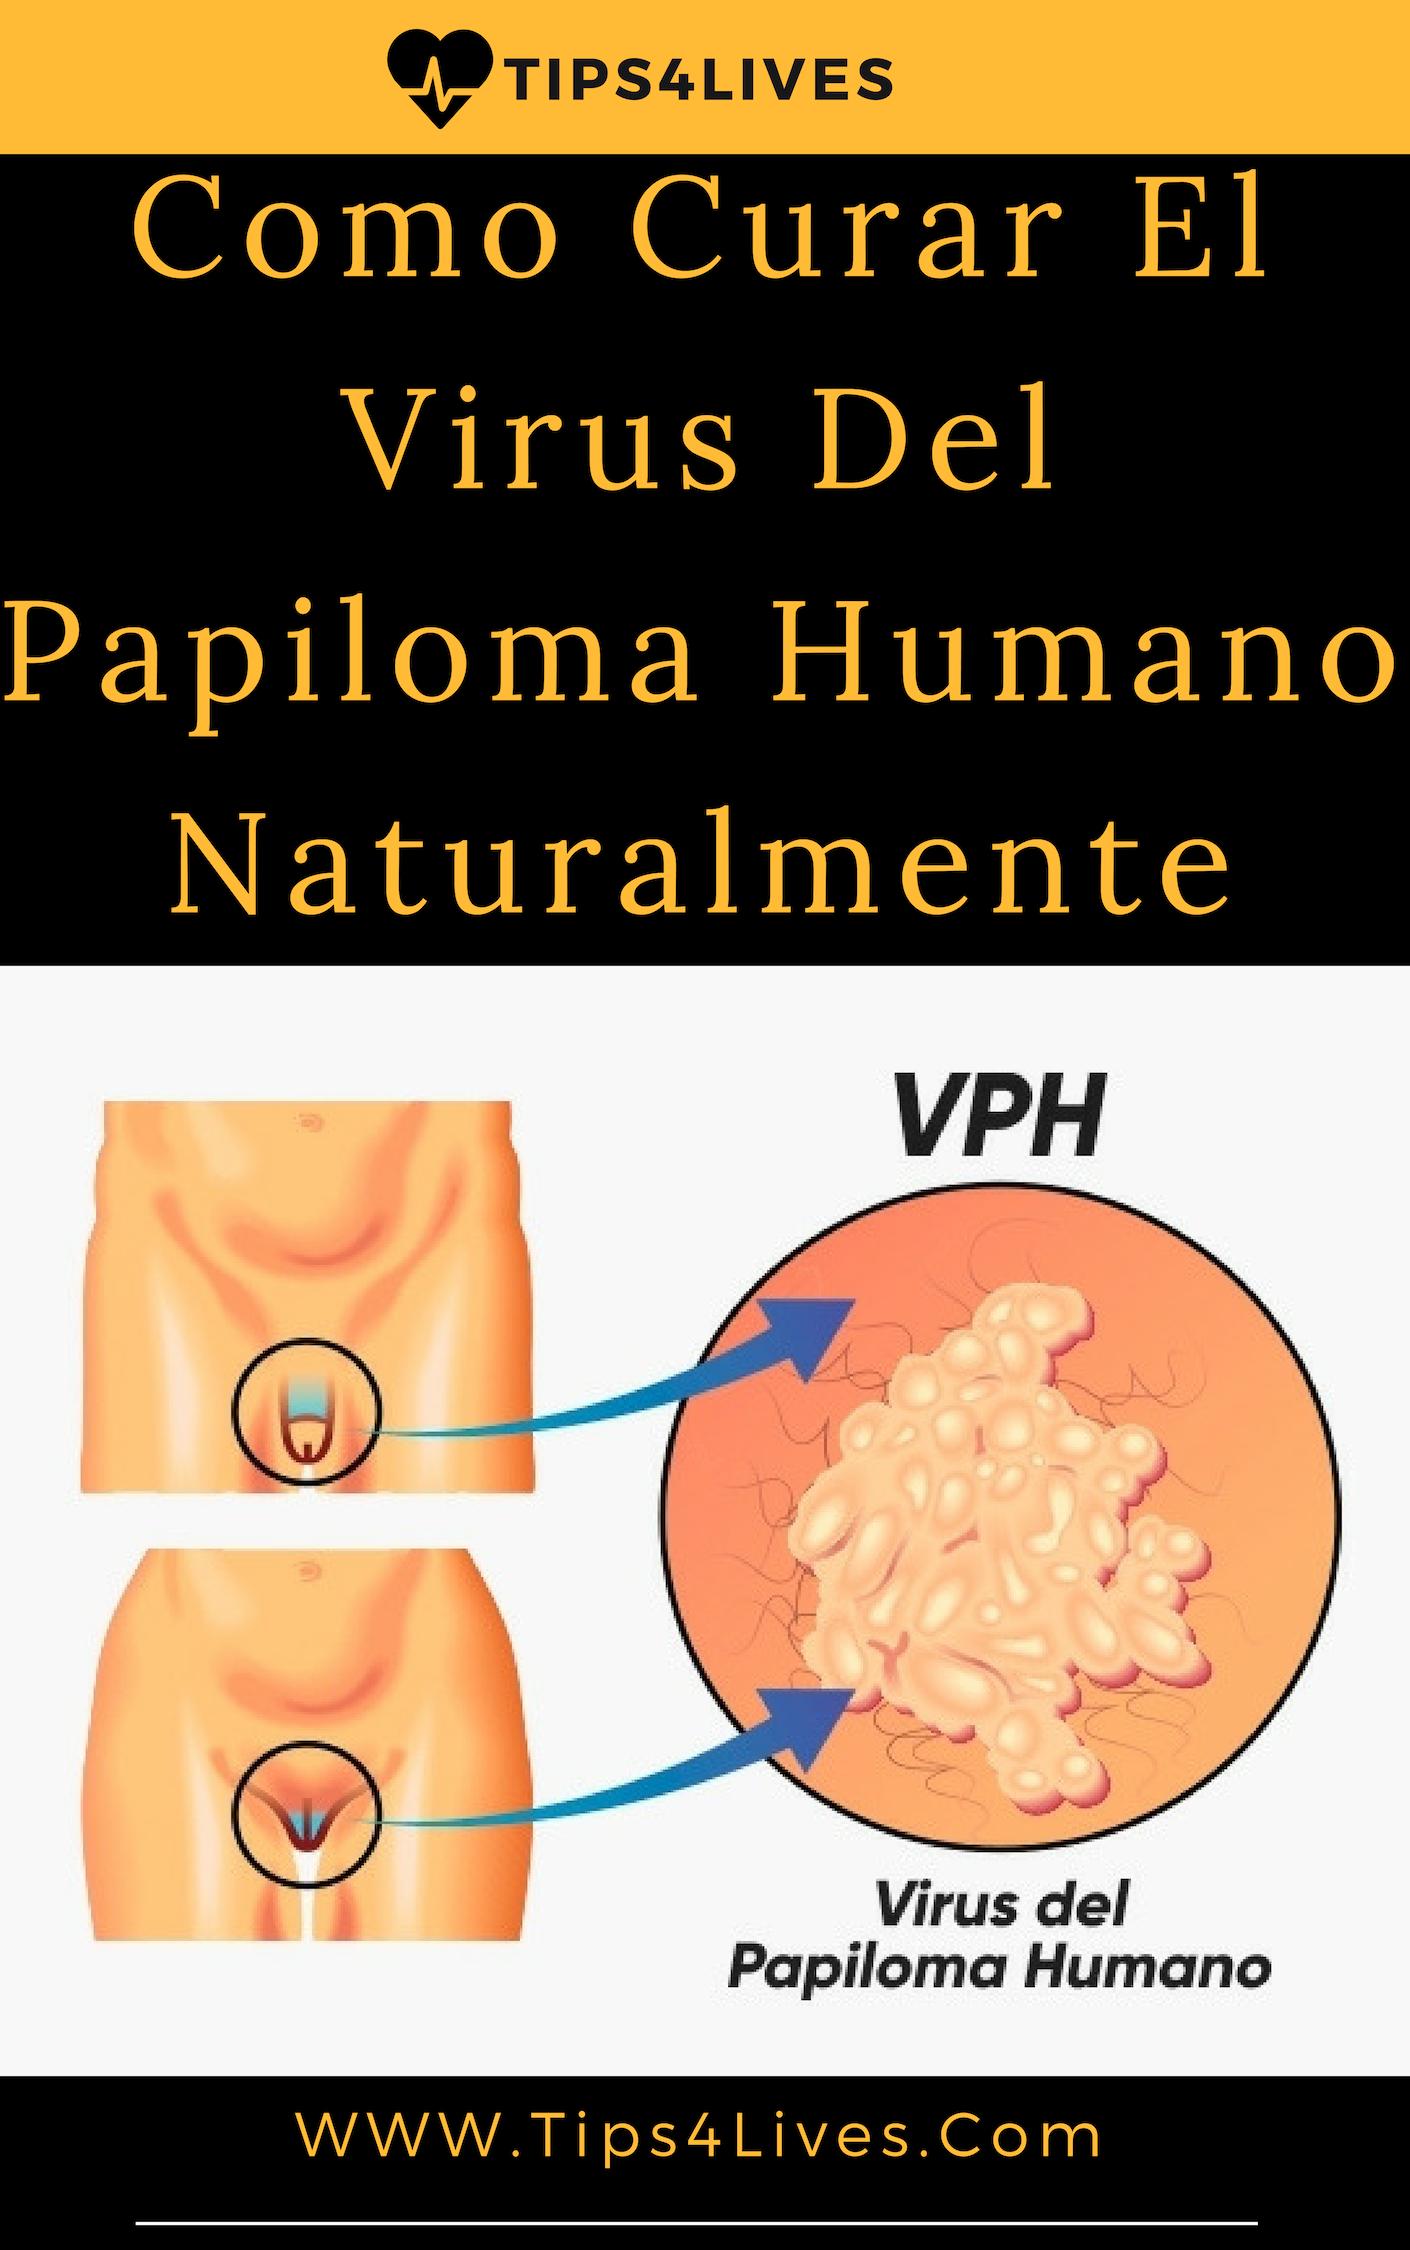 caracteristicas del papiloma humano genital